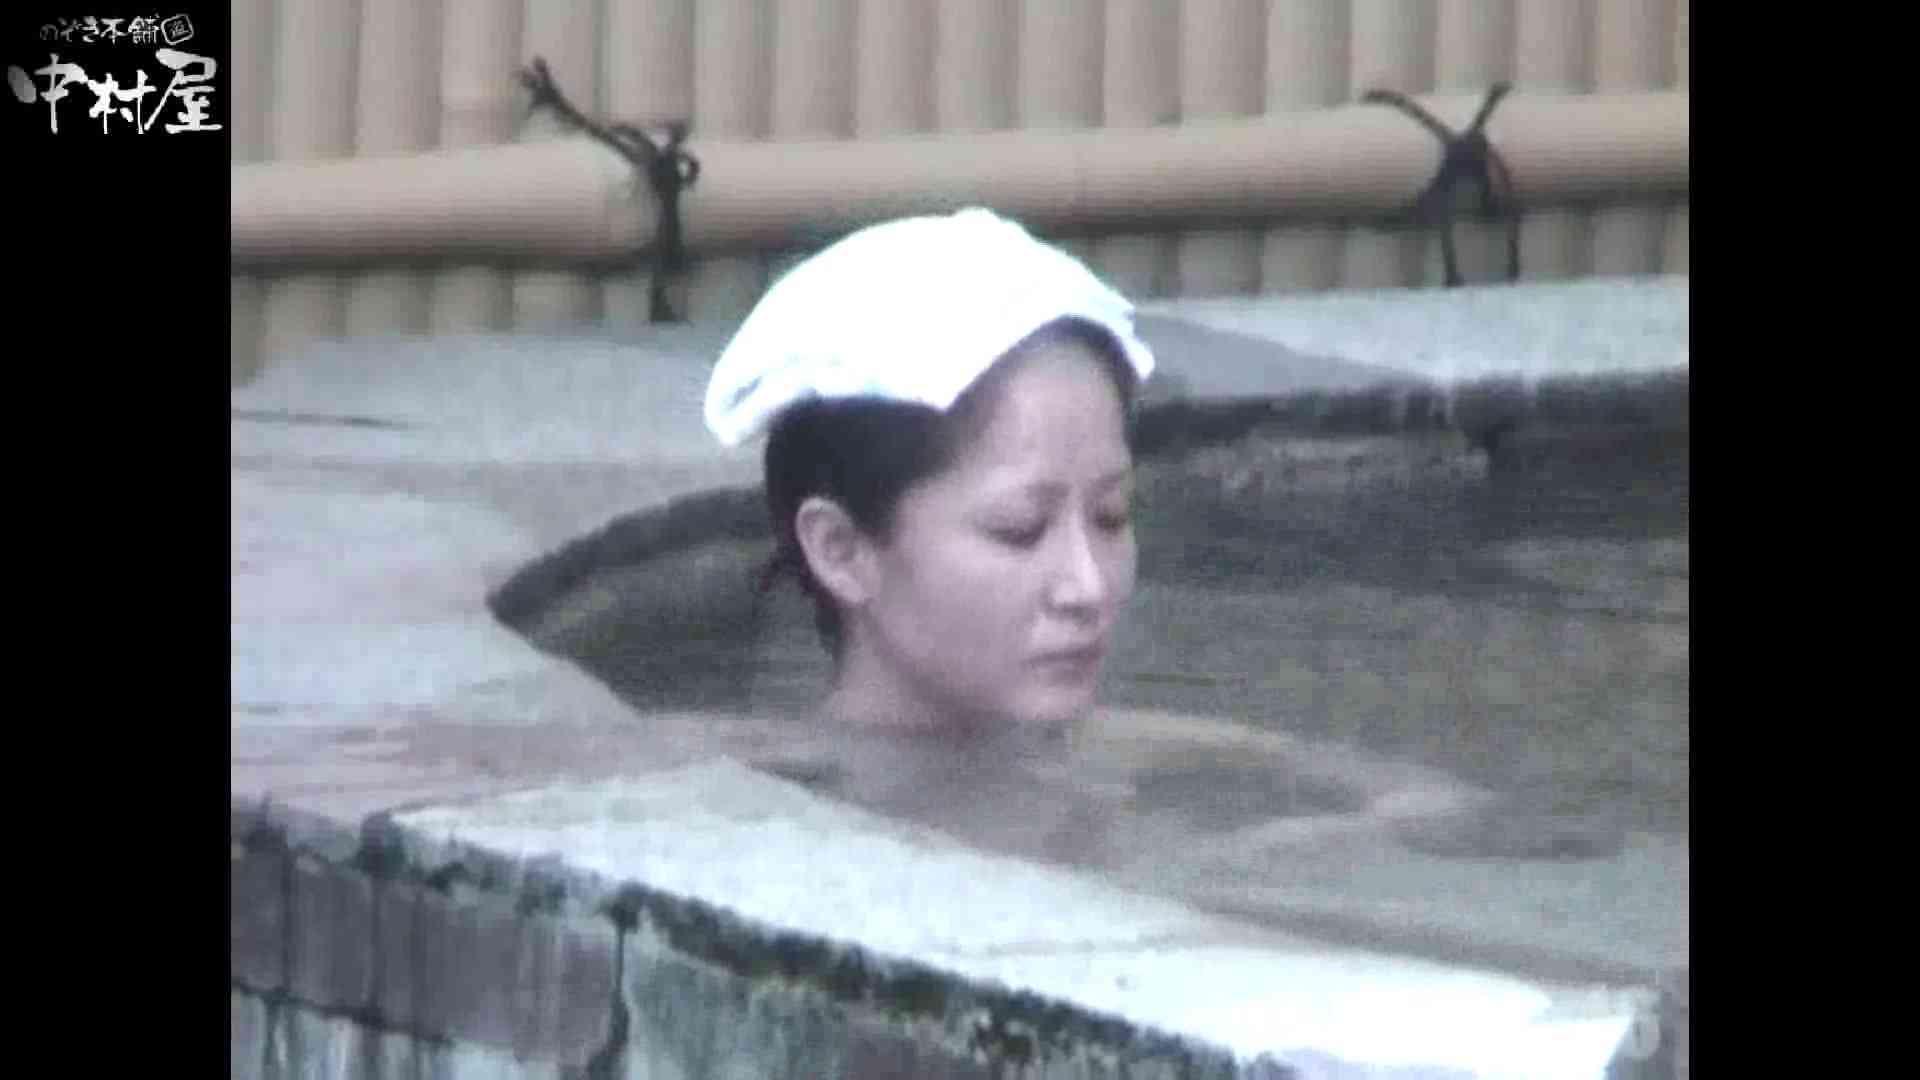 Aquaな露天風呂Vol.880潜入盗撮露天風呂十六判湯 其の六 露天 | 潜入シリーズ  95pic 77